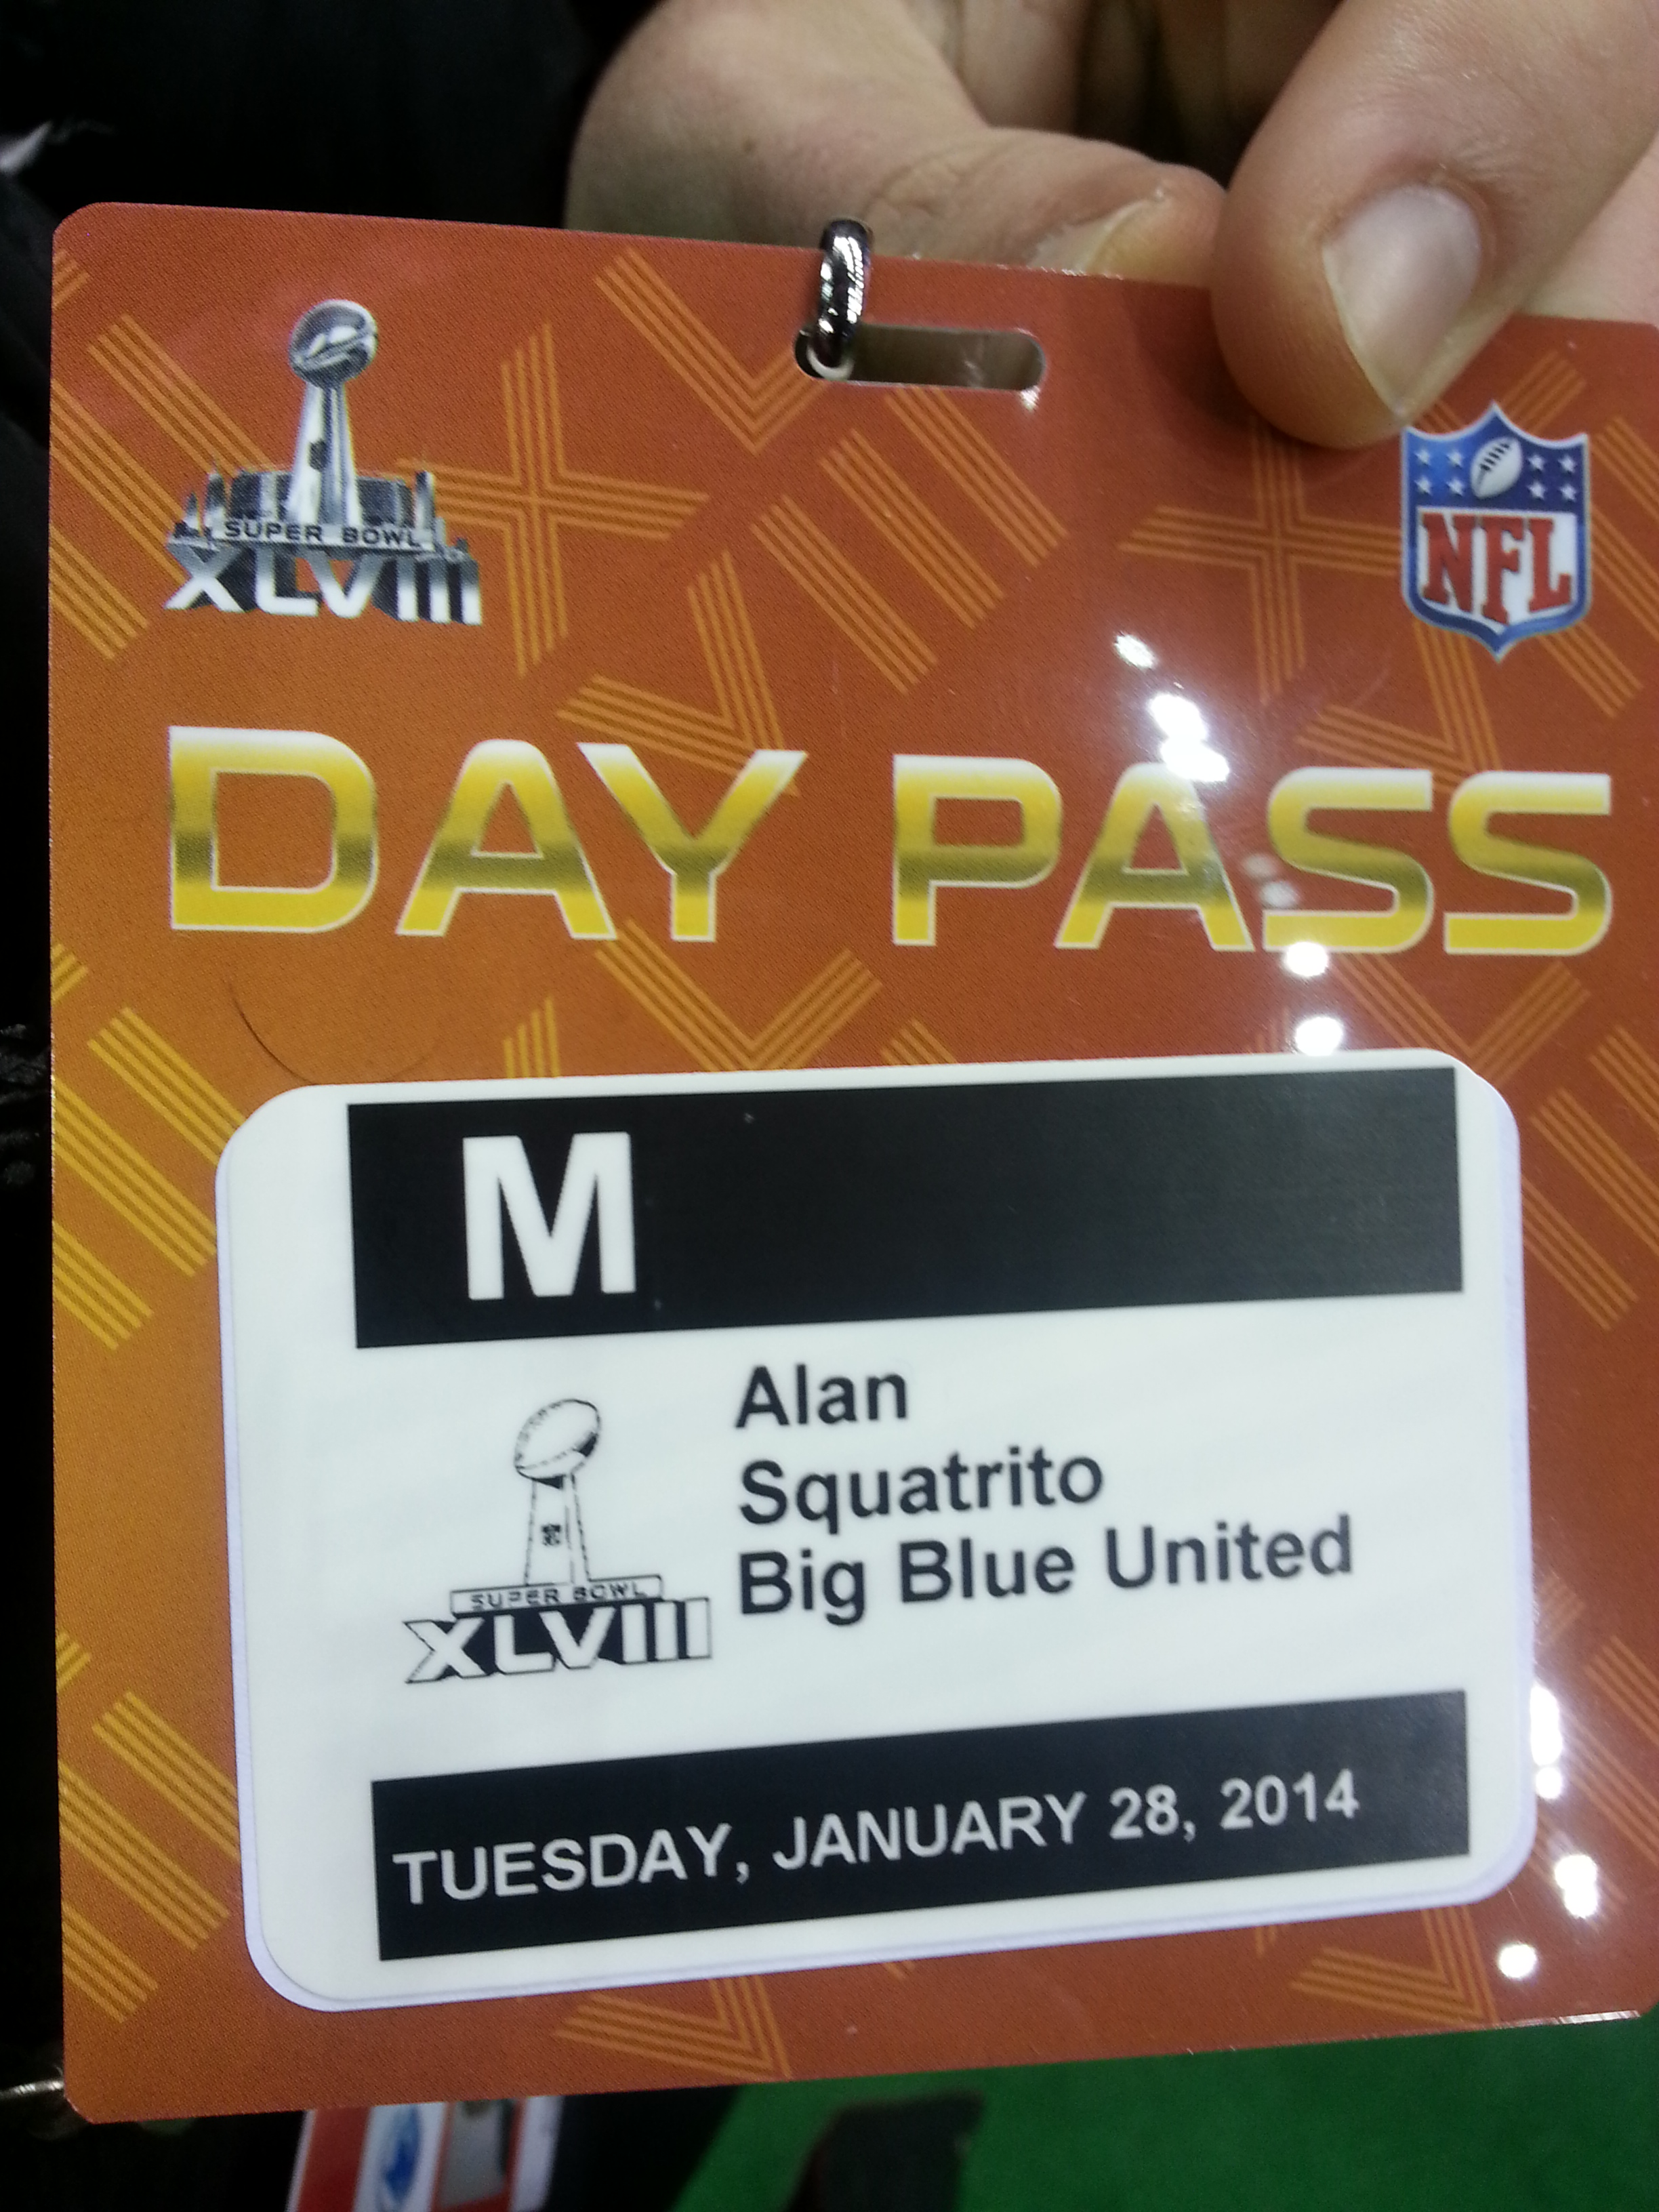 Media Day Pass